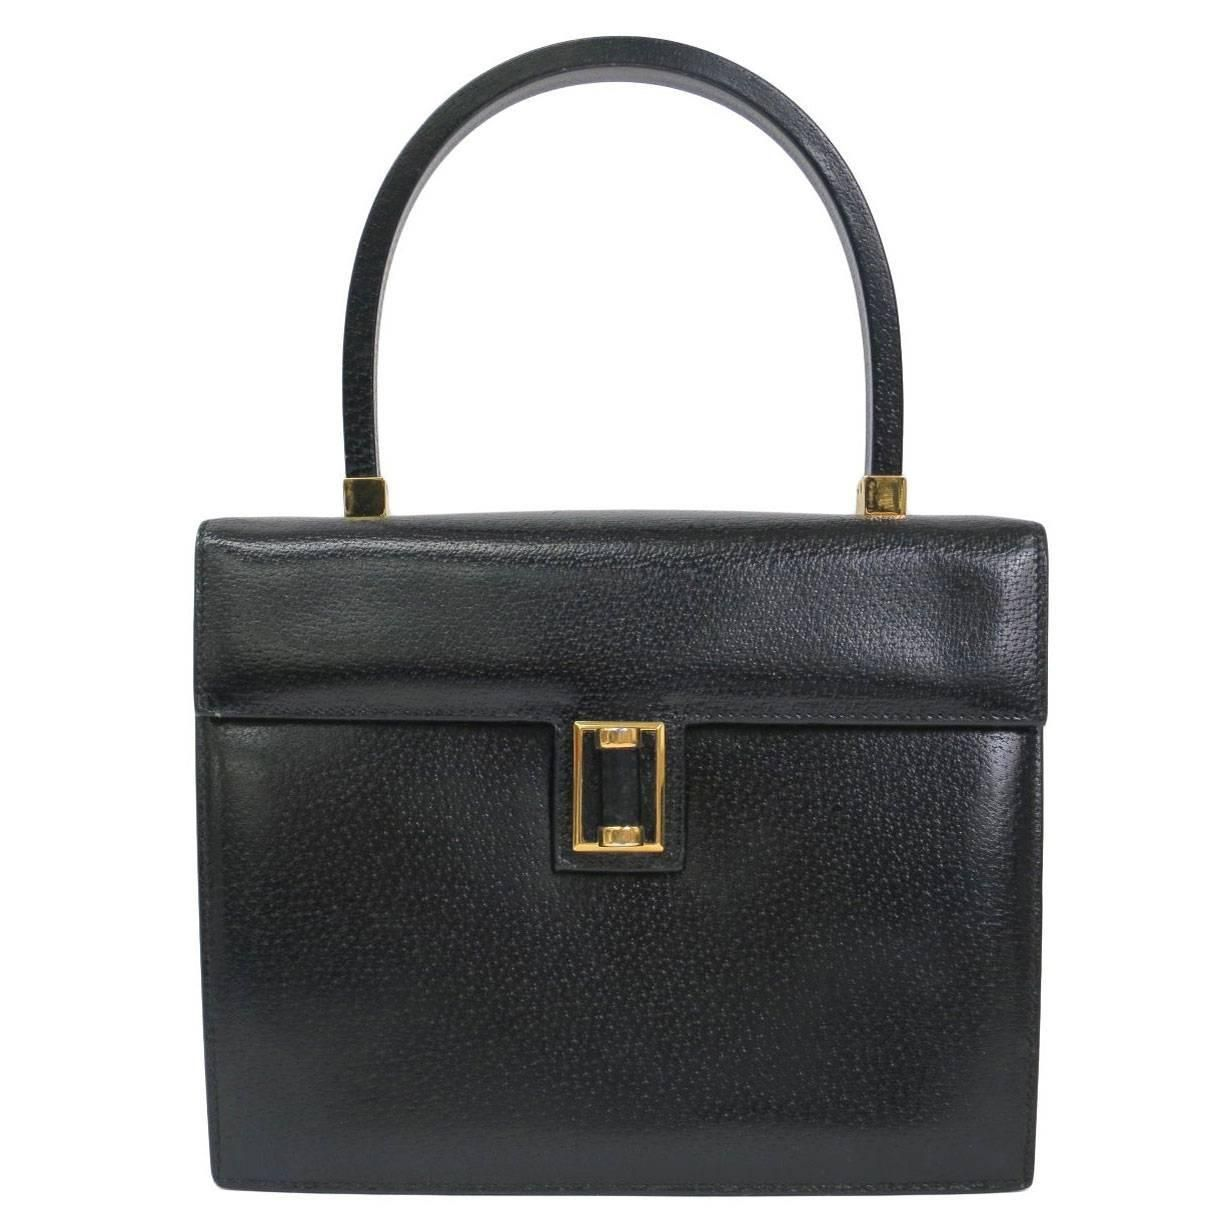 Gucci Black Ostrich Evening Kelly Style Top Handle Satchel Shoulder Bag 4MCotm